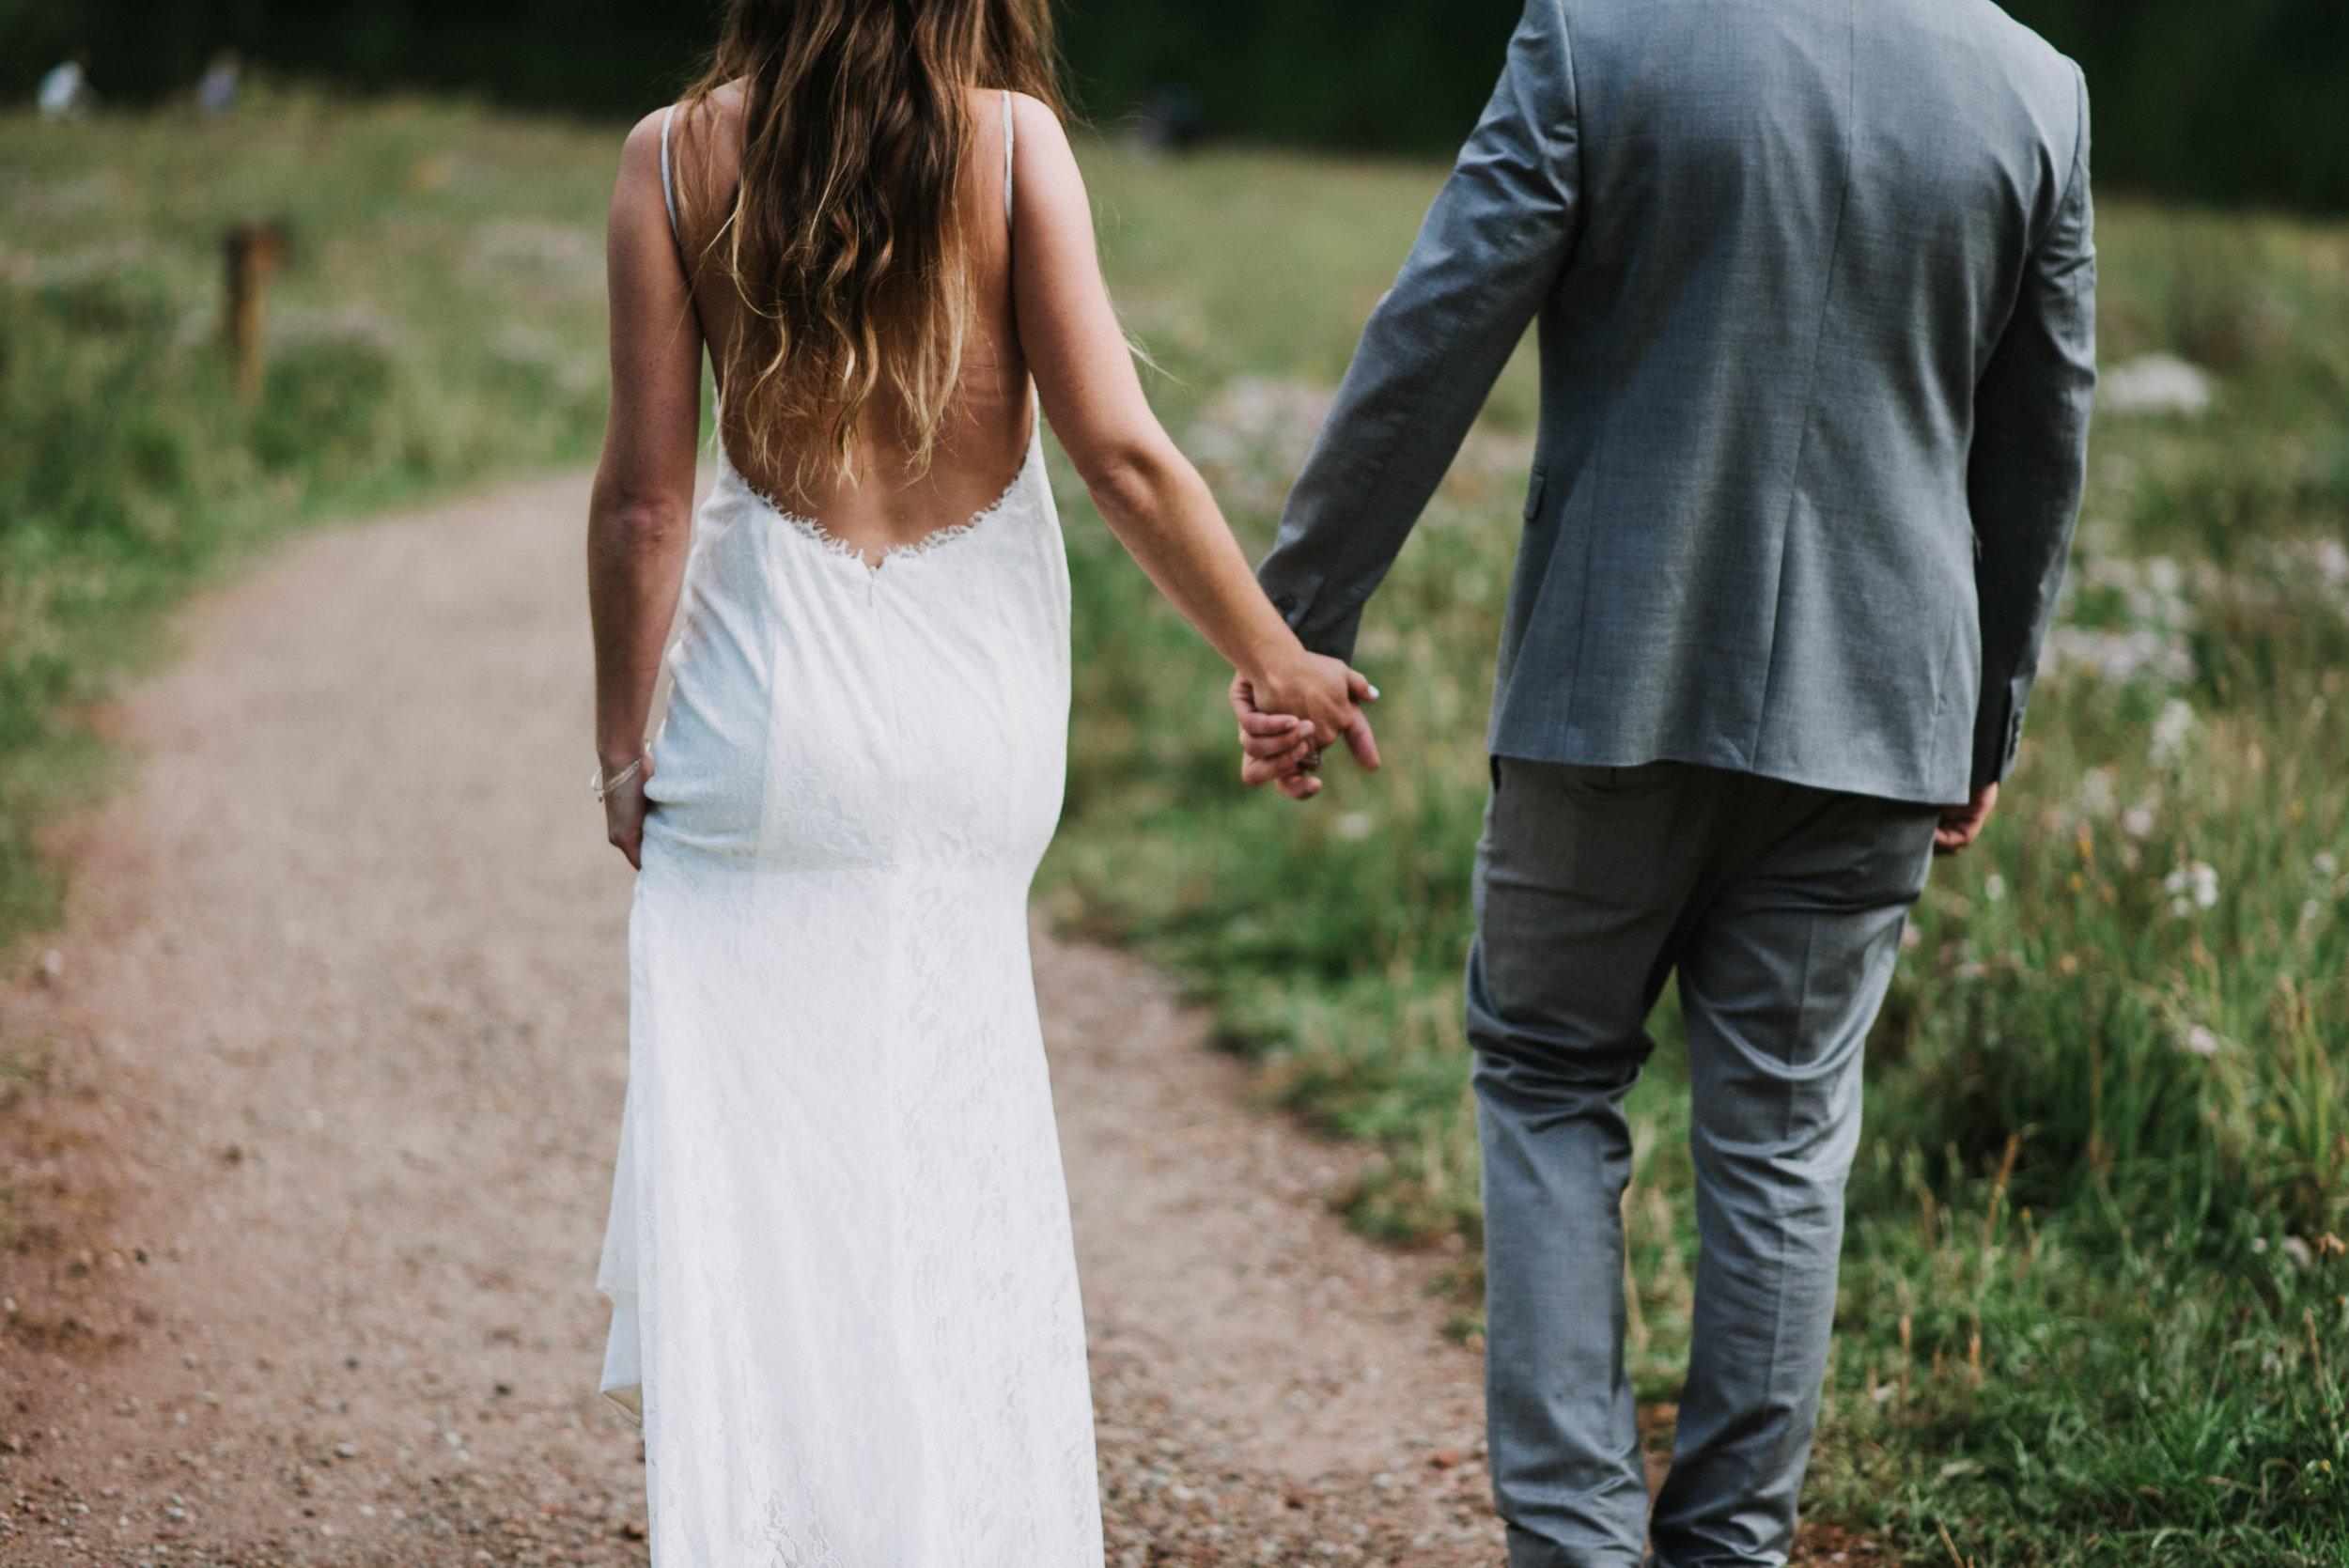 Heather and Darren holding hands during their Maroon Bells Elopement.